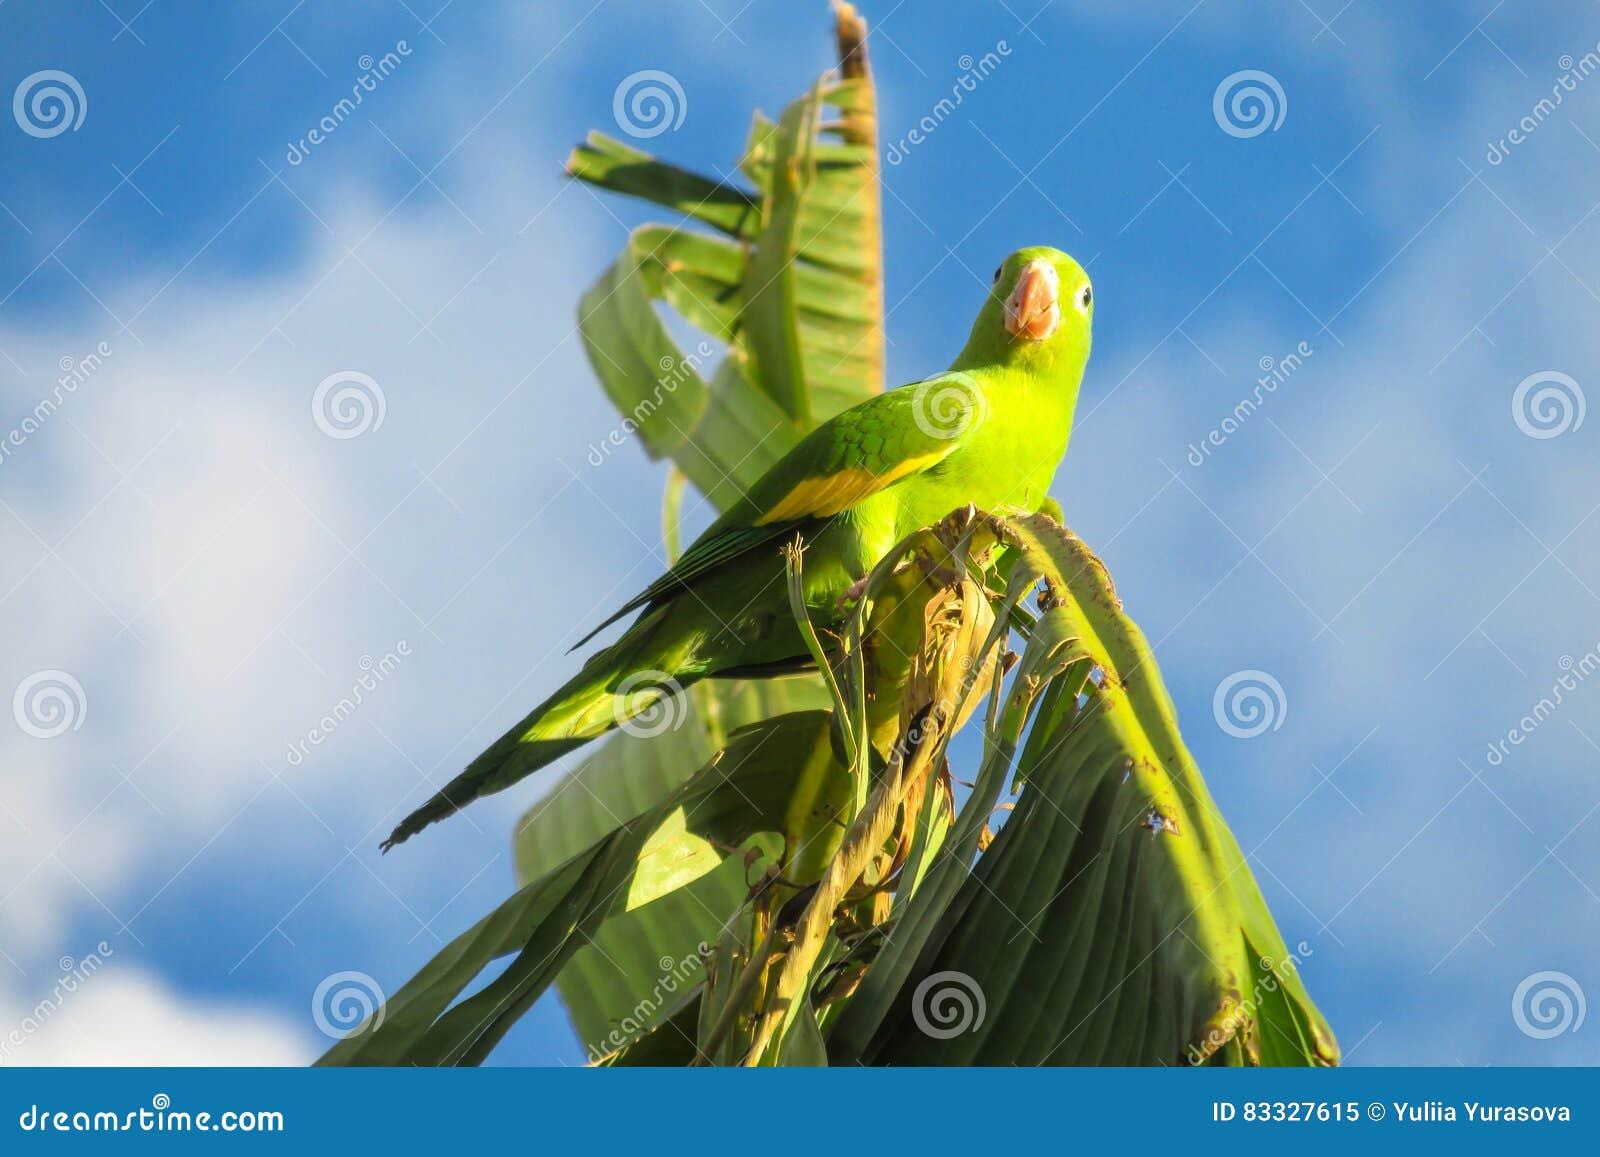 Small green parrot on banana tree branch